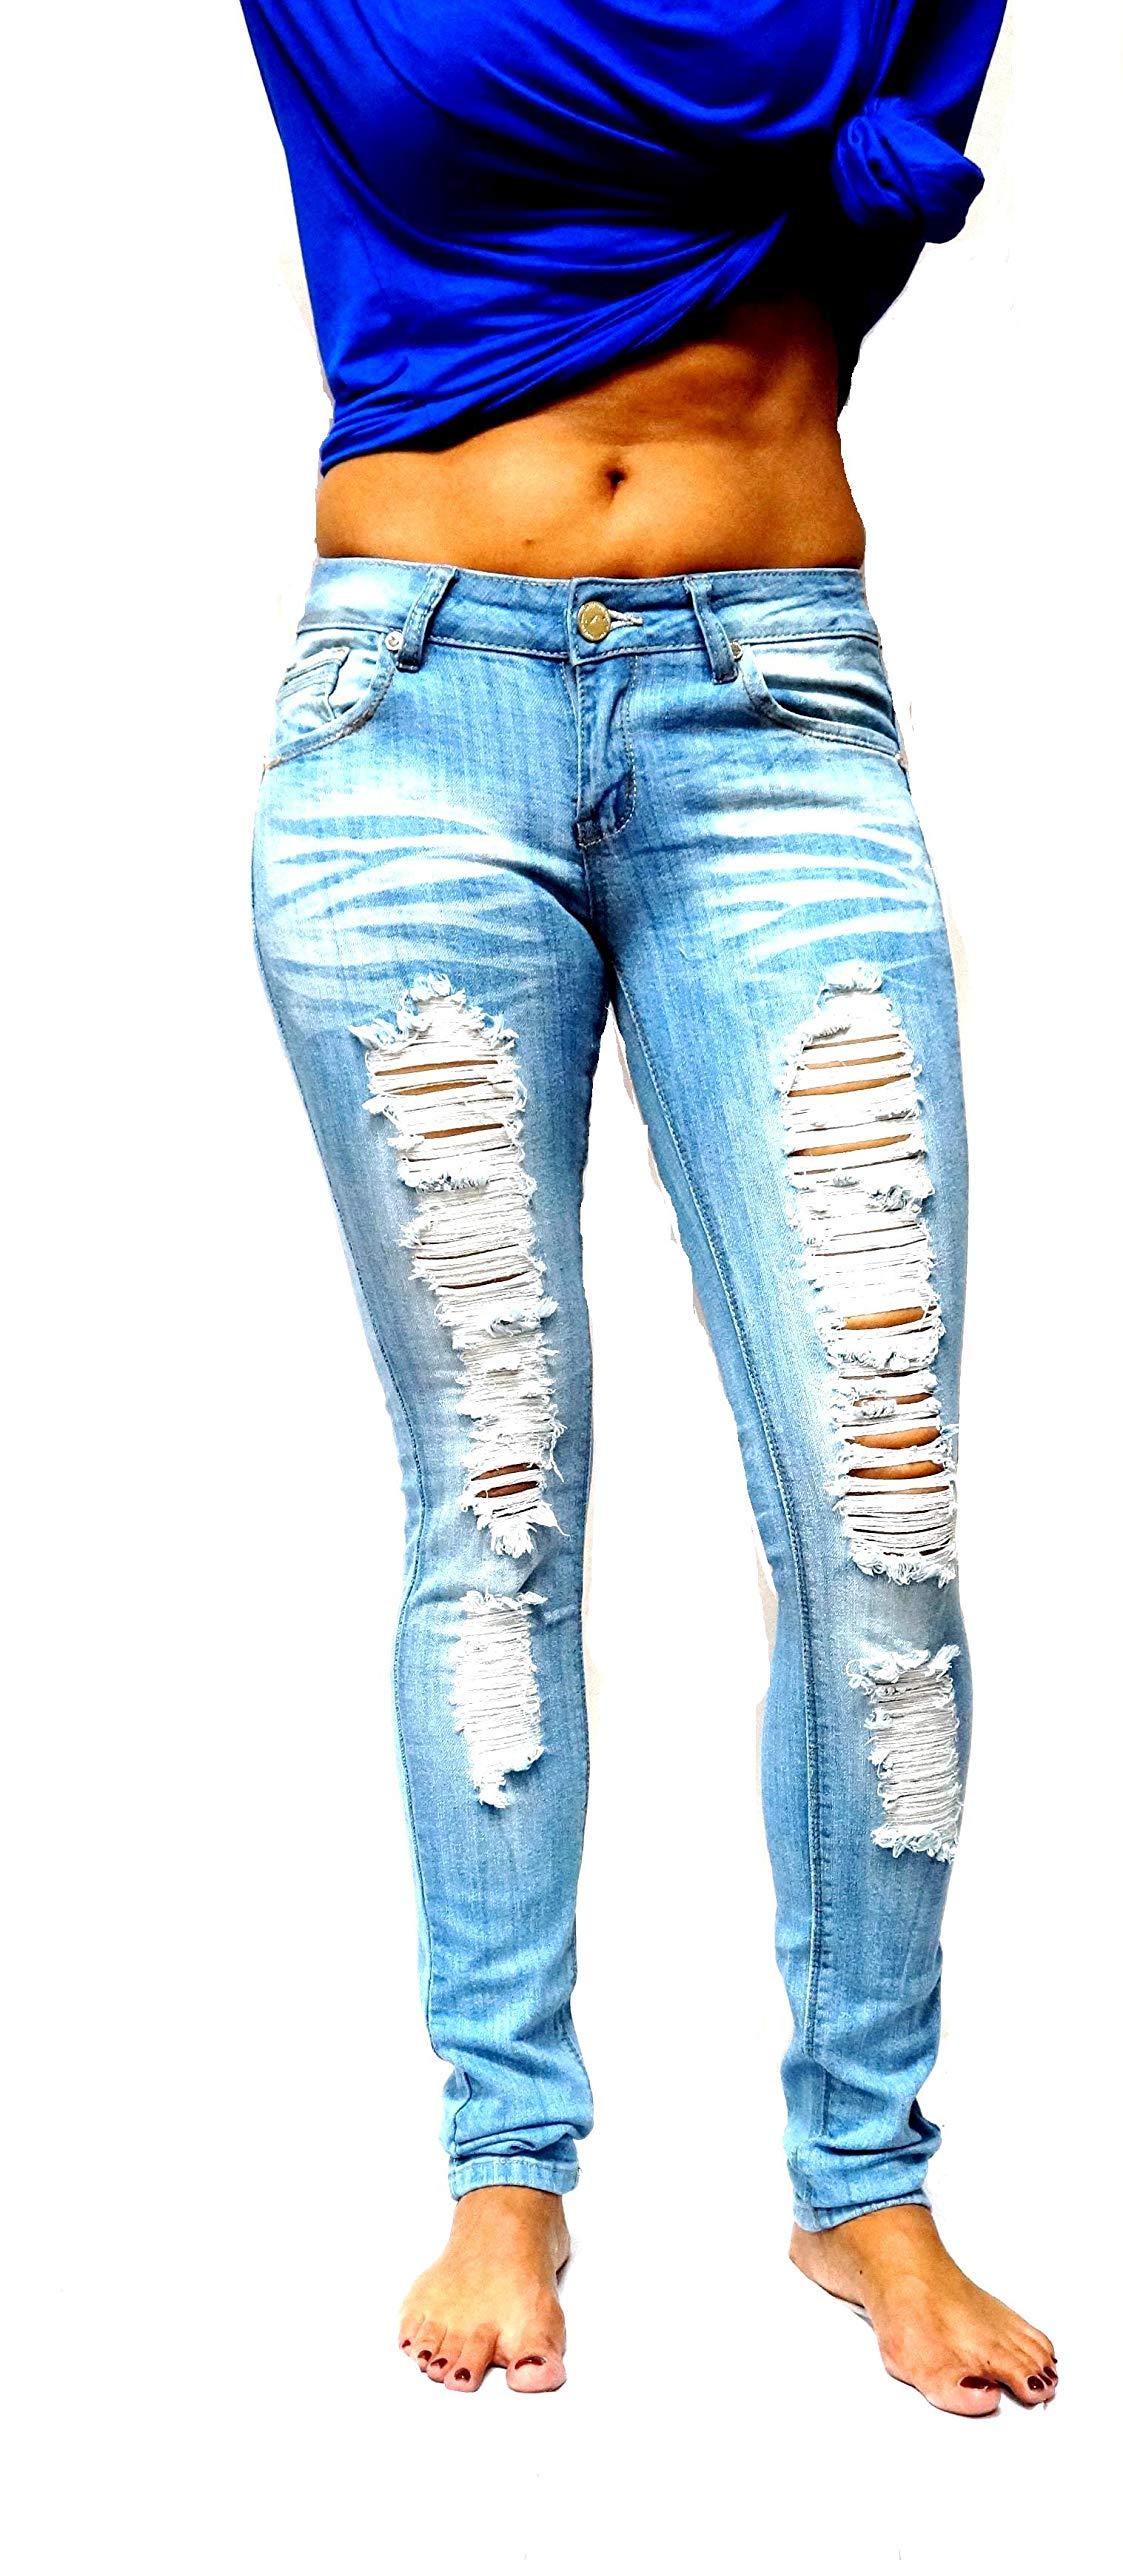 Jack David Womens Distressed Denim Jeans Ripped Blue Skinny Destroy Stretch Jean Pants (15, K442H -Light Blue)